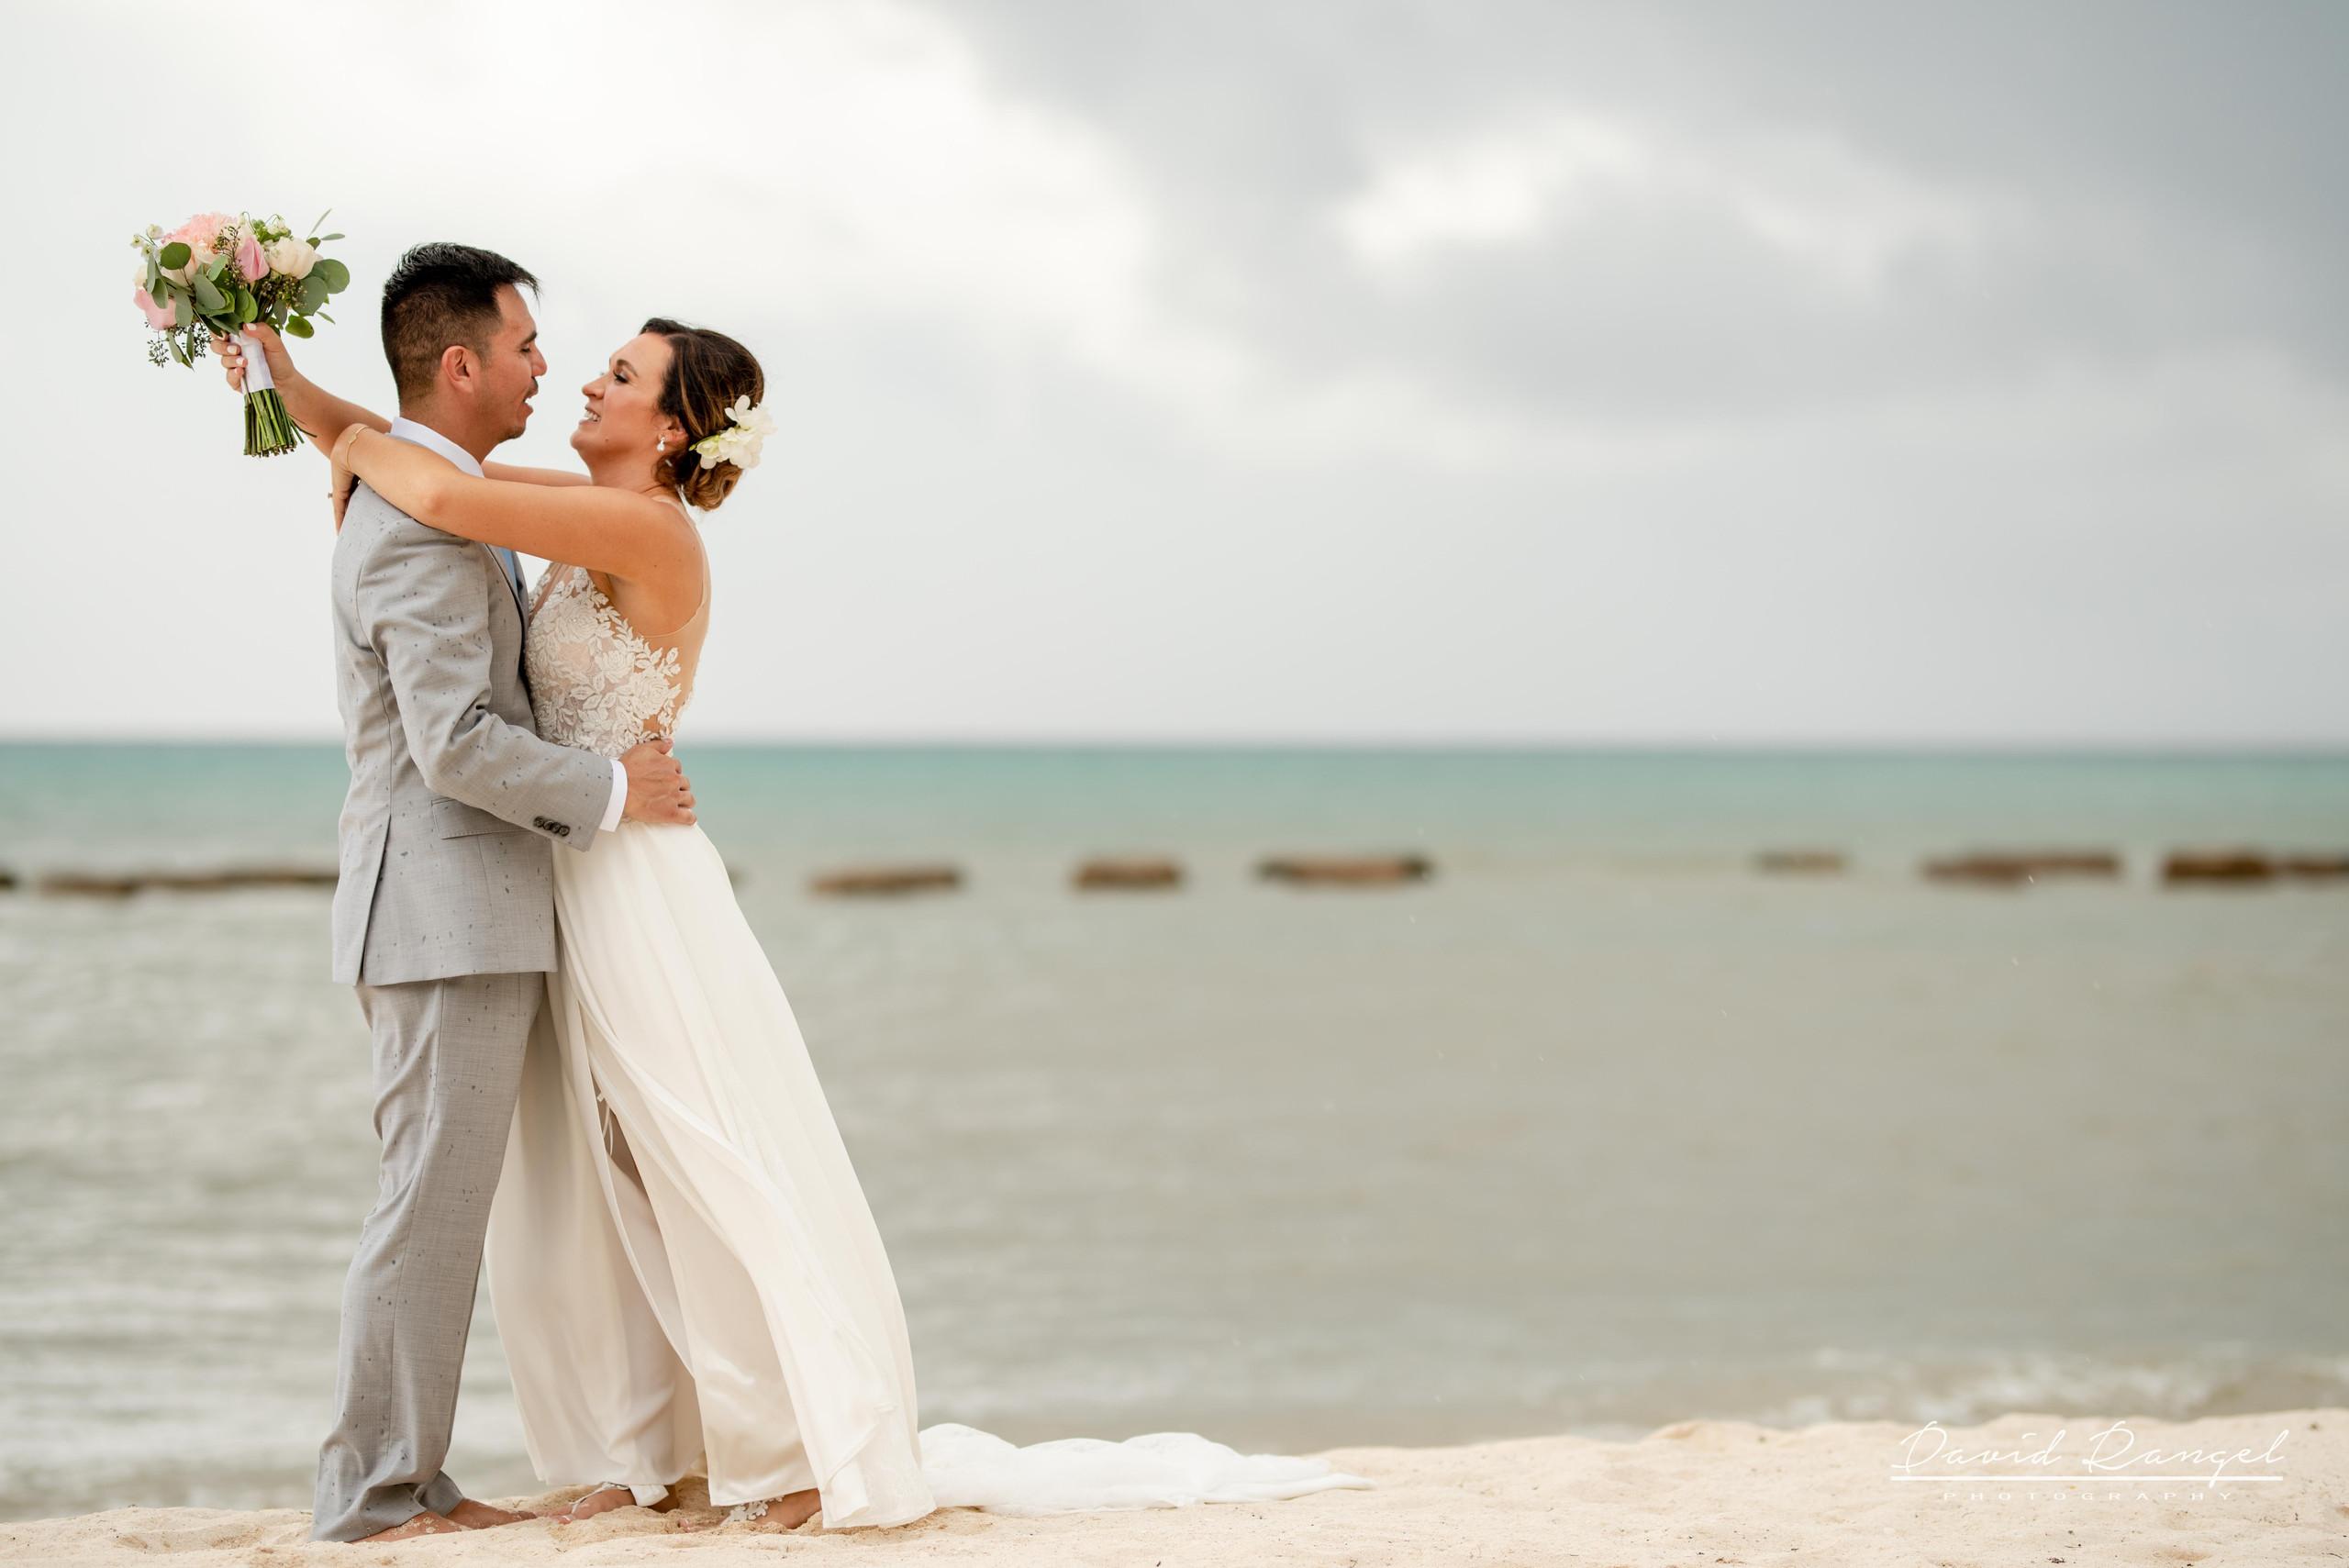 Beach+photo+session+couple+love+hugh